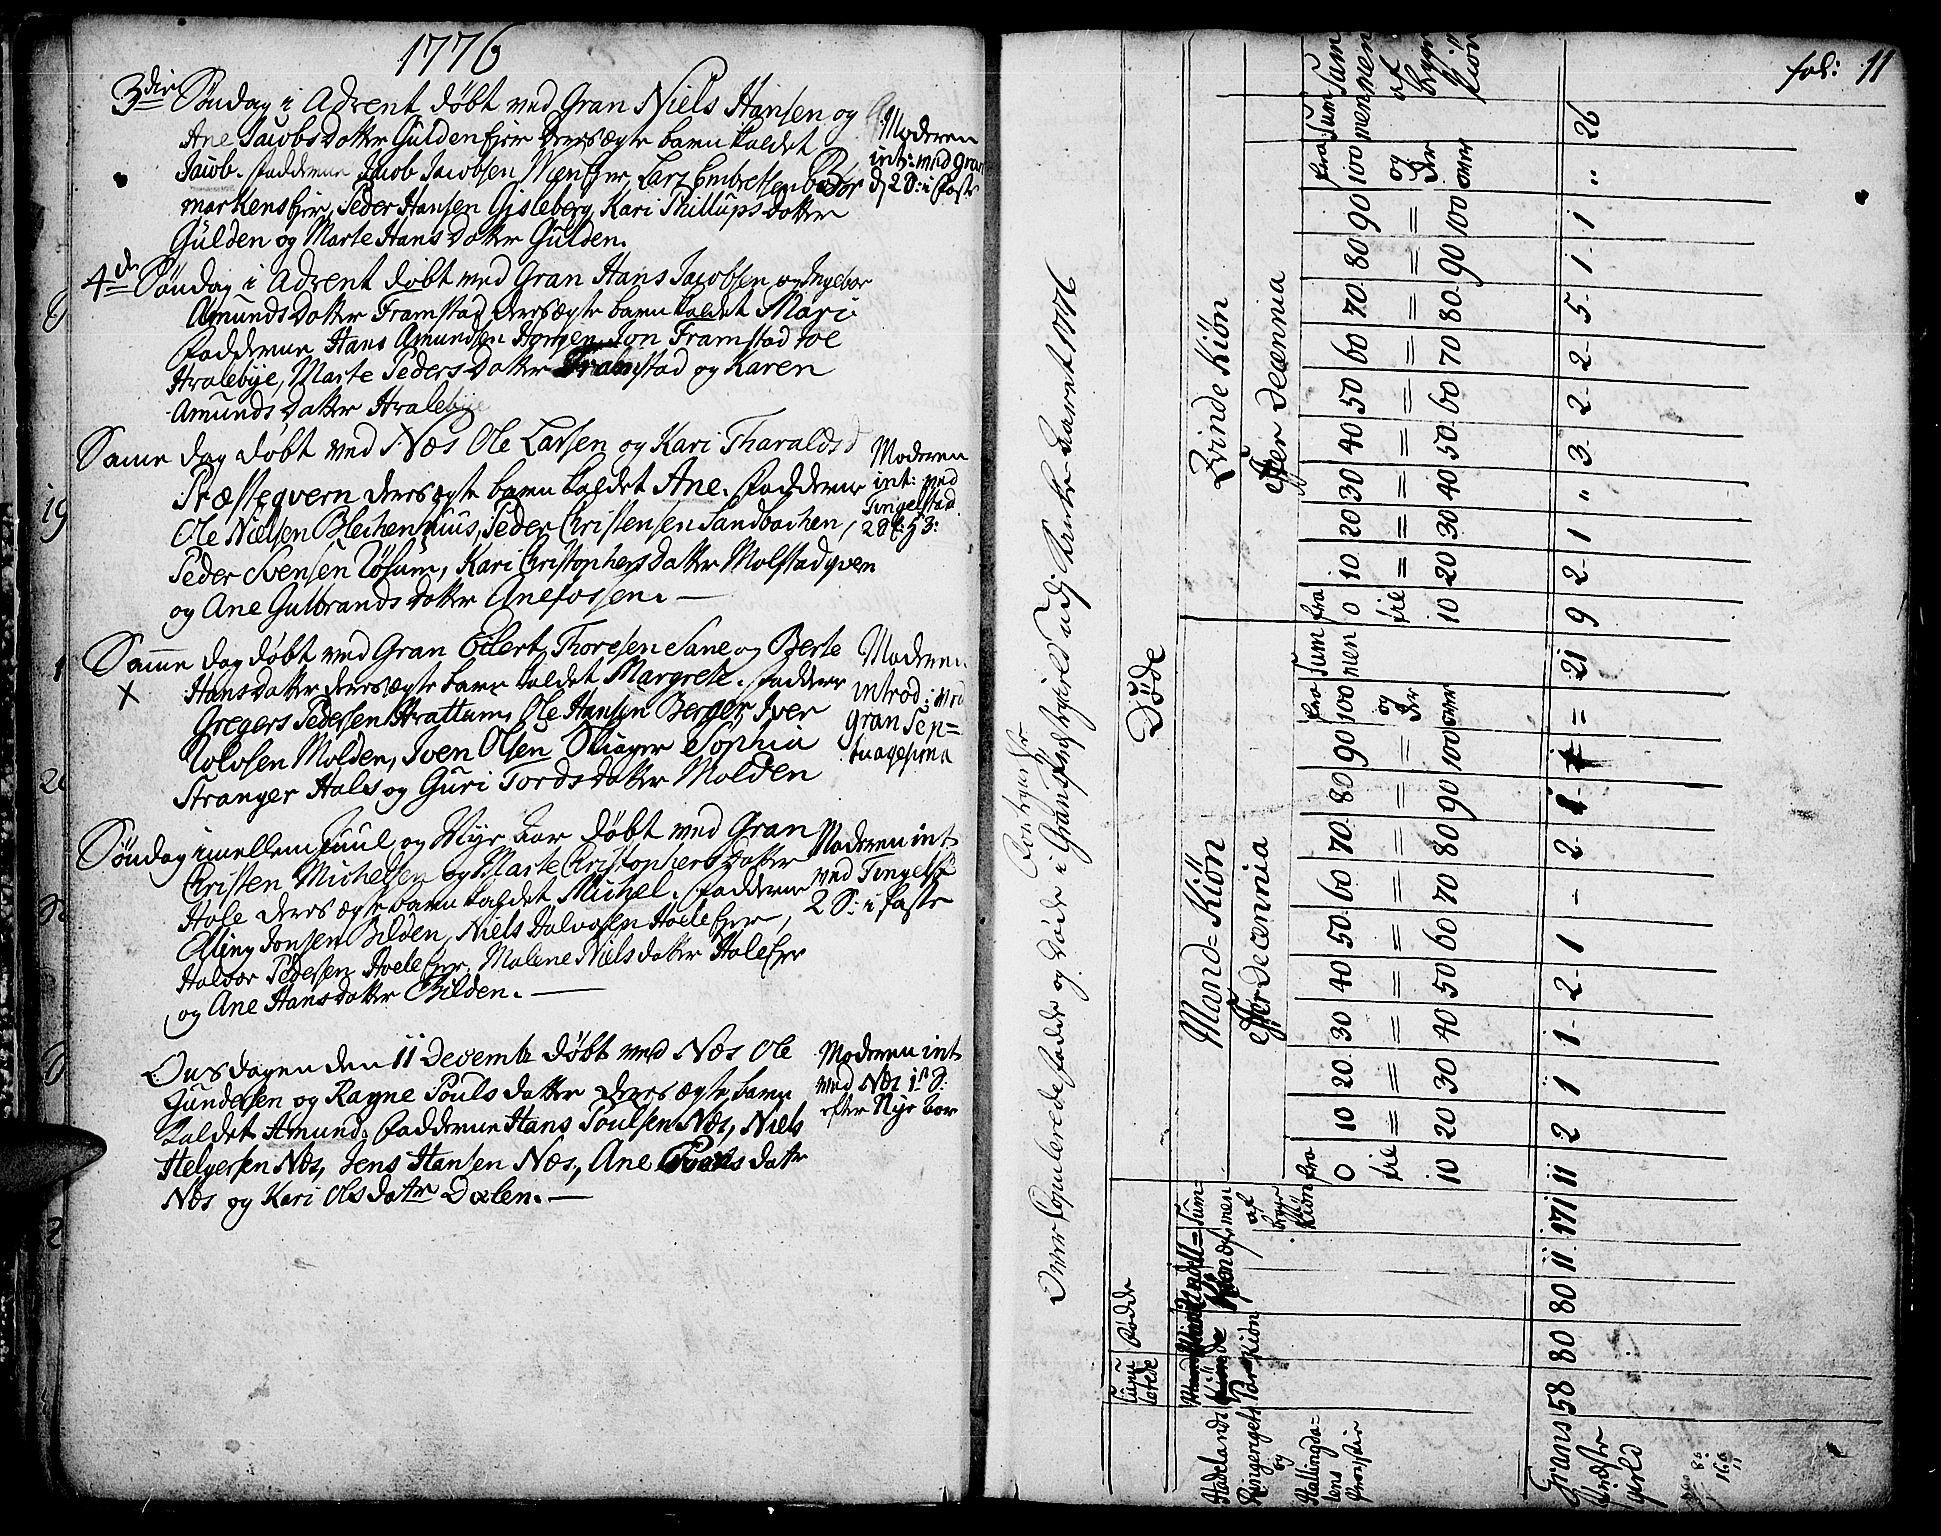 SAH, Gran prestekontor, Ministerialbok nr. 5, 1776-1788, s. 11